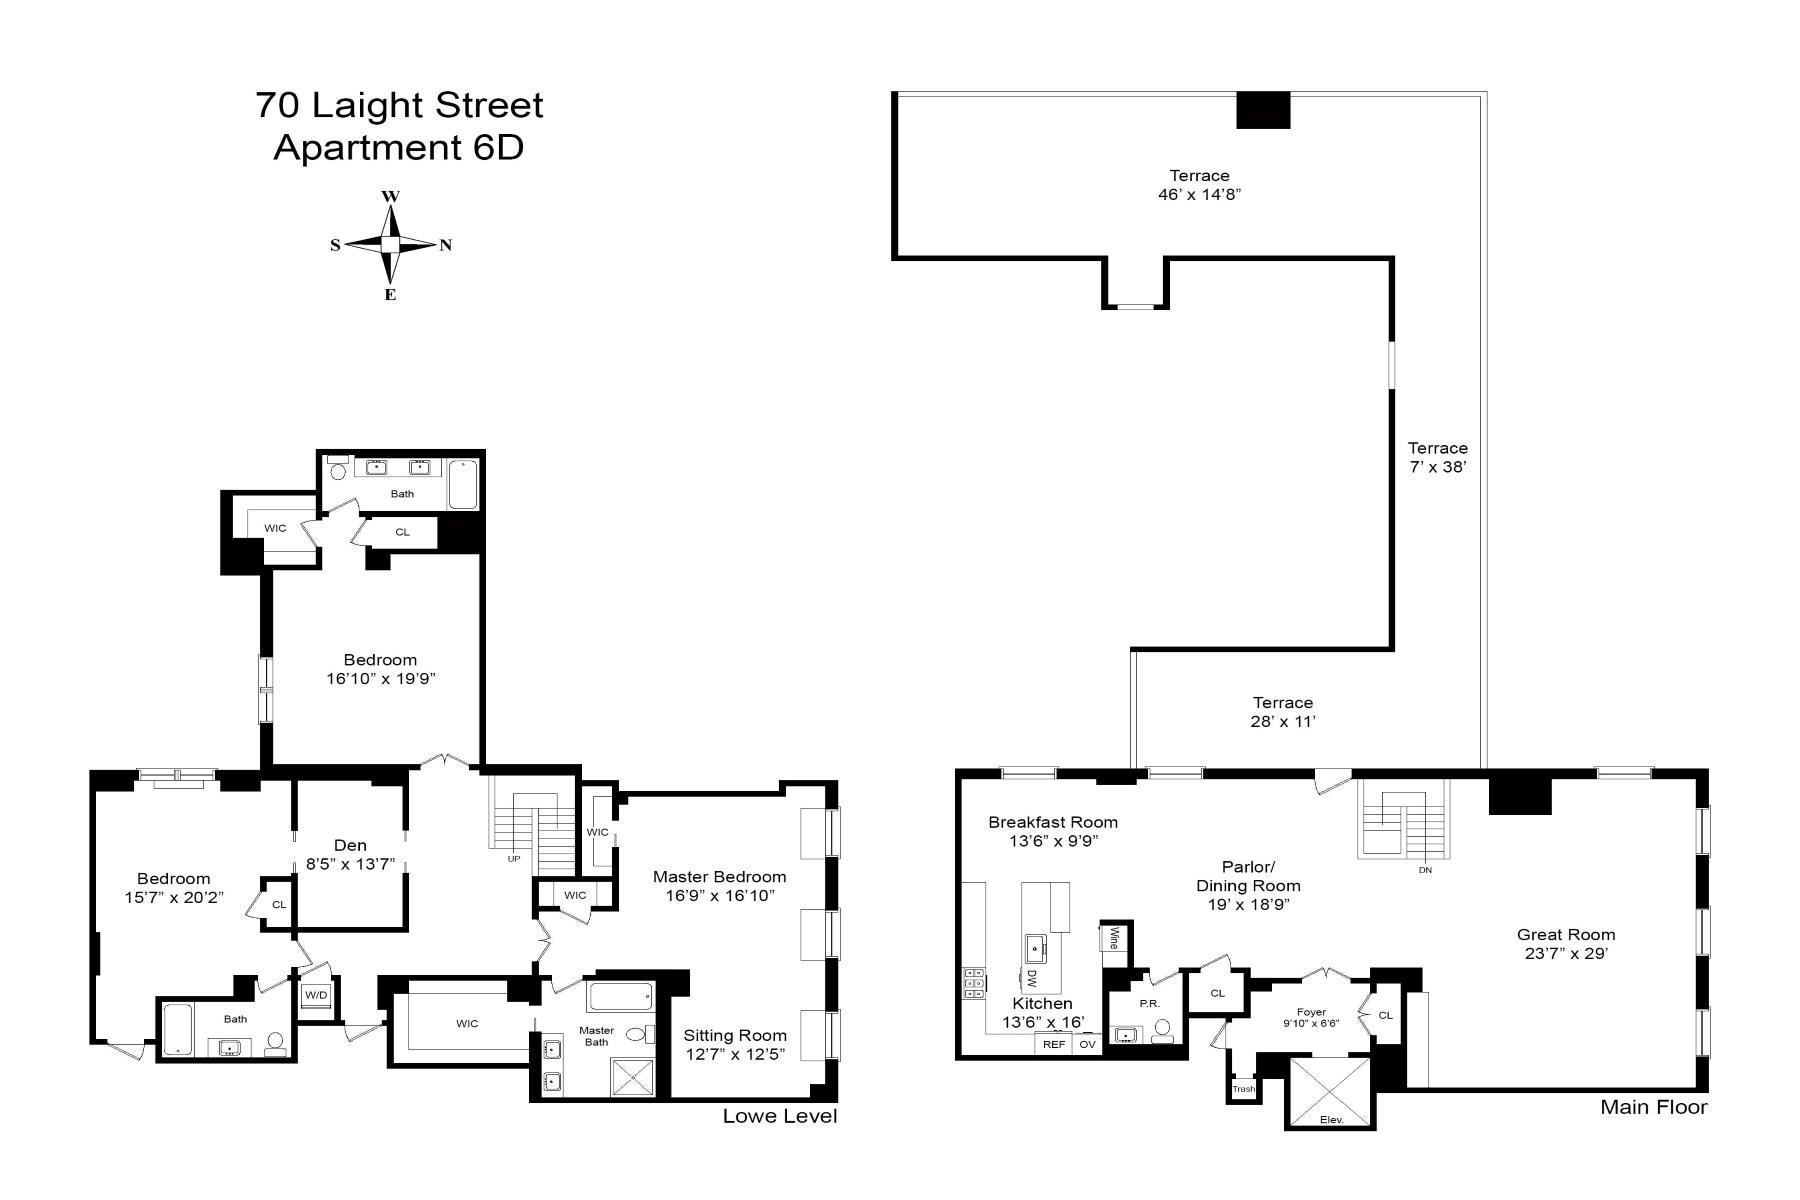 Condominium for Sale at Corner PH Duplex Loft w/ Outdoor Space 79 Laight Street Apt 6D New York, New York 10013 United States